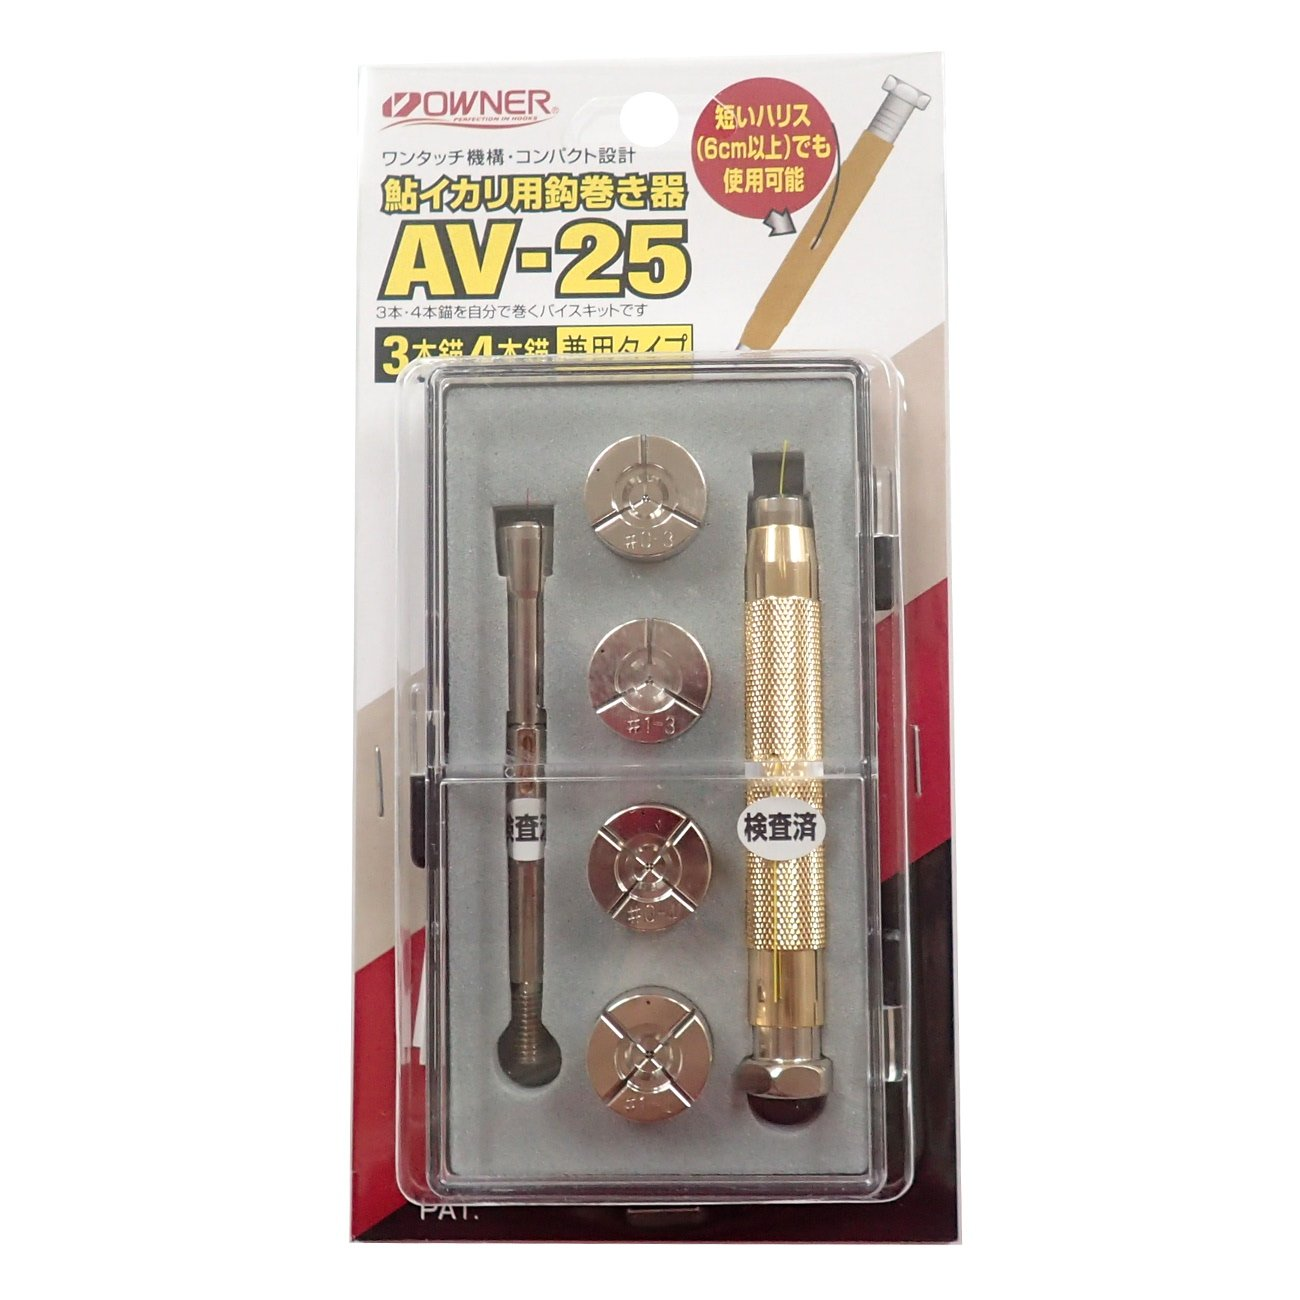 OWNER(オーナー) 針結び器 鮎イカリ用鈎巻き器 AV-25 フルセット 9689   B004XVCBWW